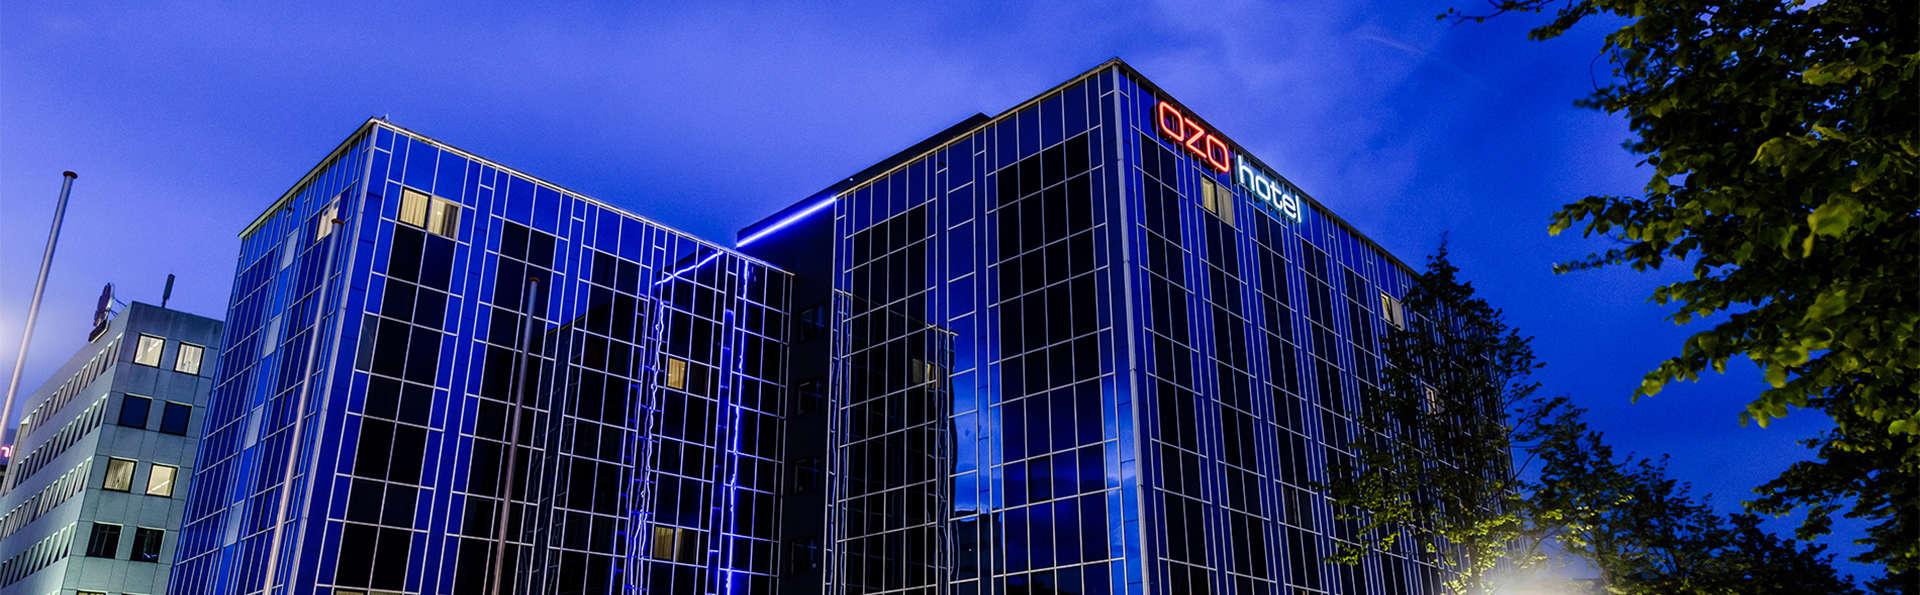 OZO Hotel Amsterdam - EDIT_Exterior1.jpg